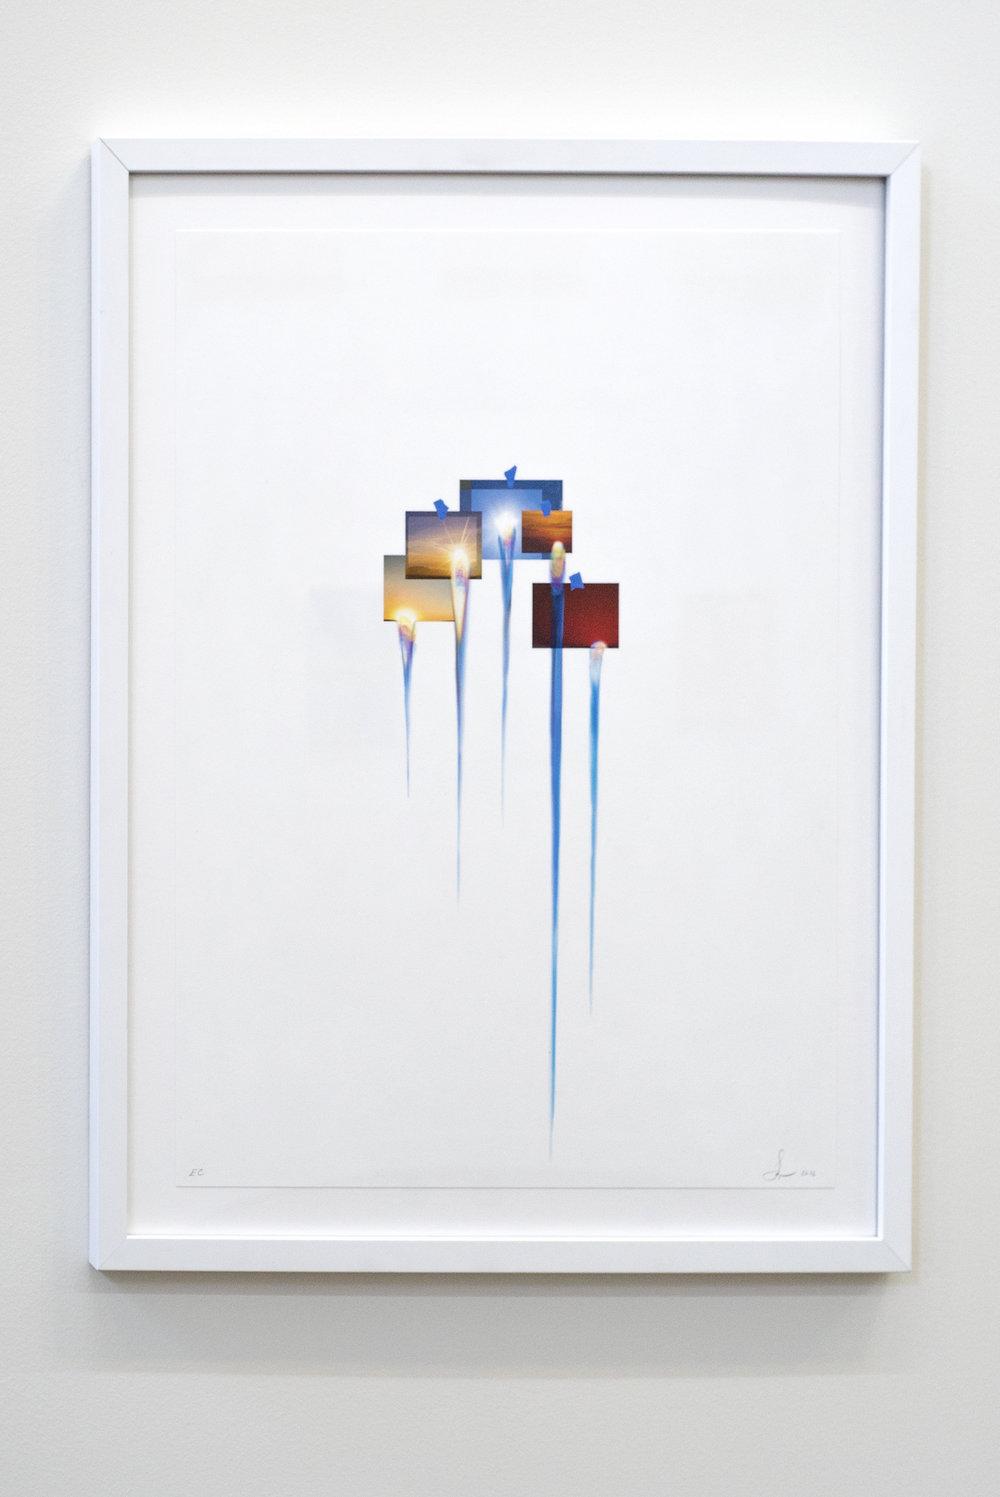 'Images in Debris'Sarah Sze, 2016.